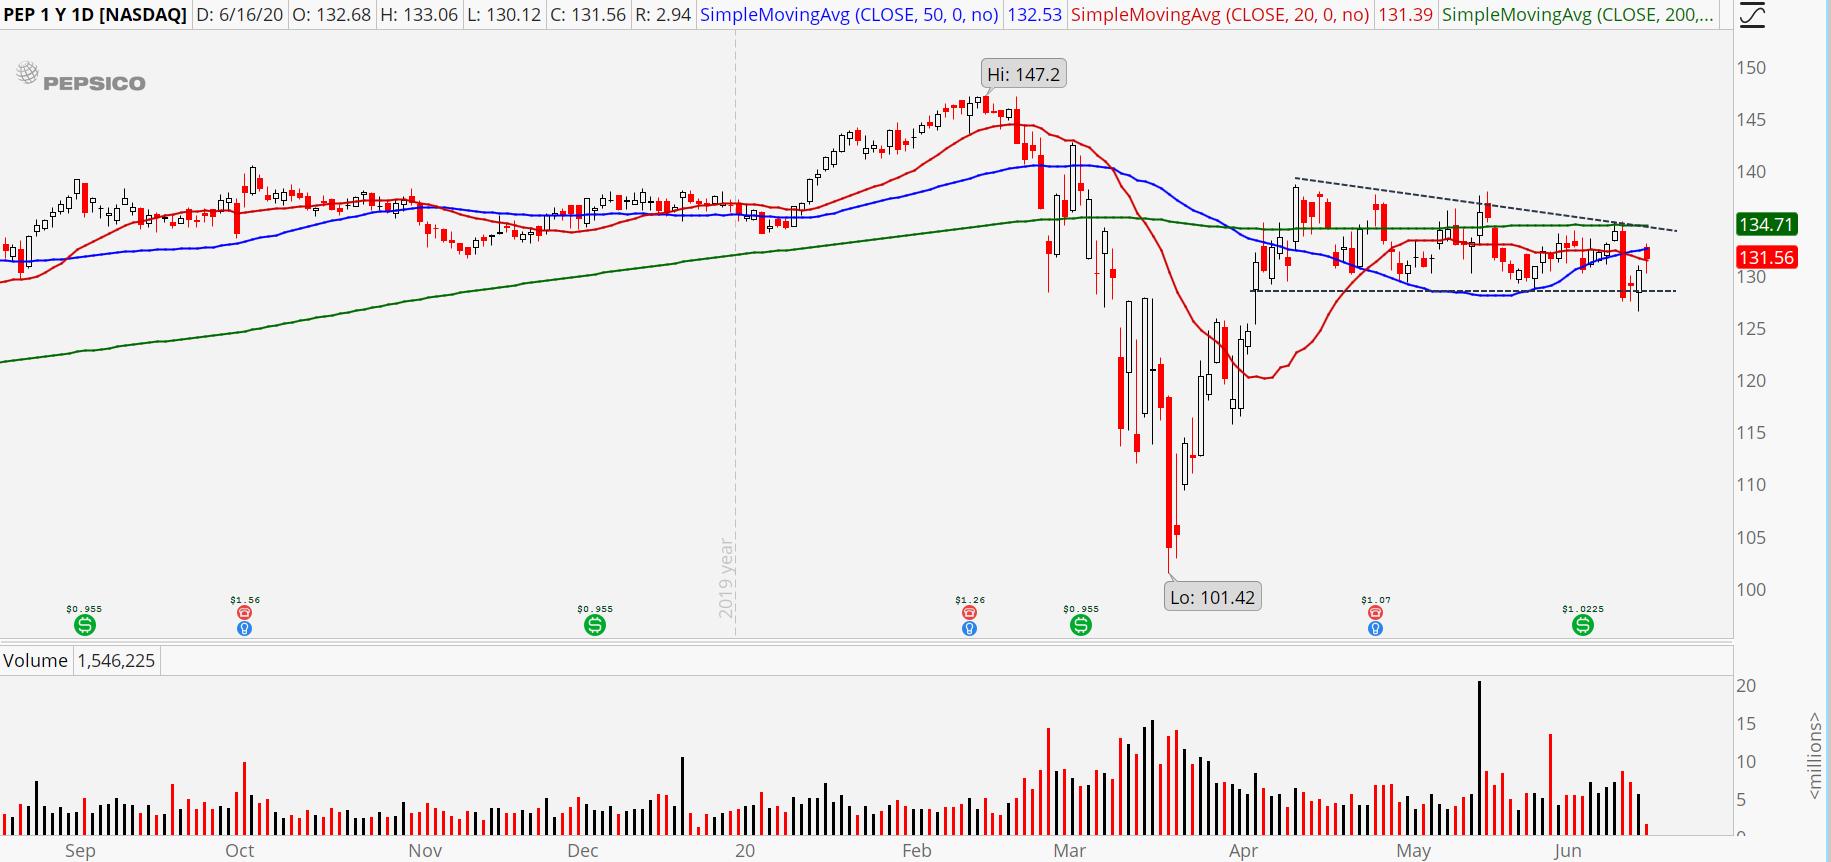 Consumer Staples Stocks to Sell: PepsiCo (PEP)